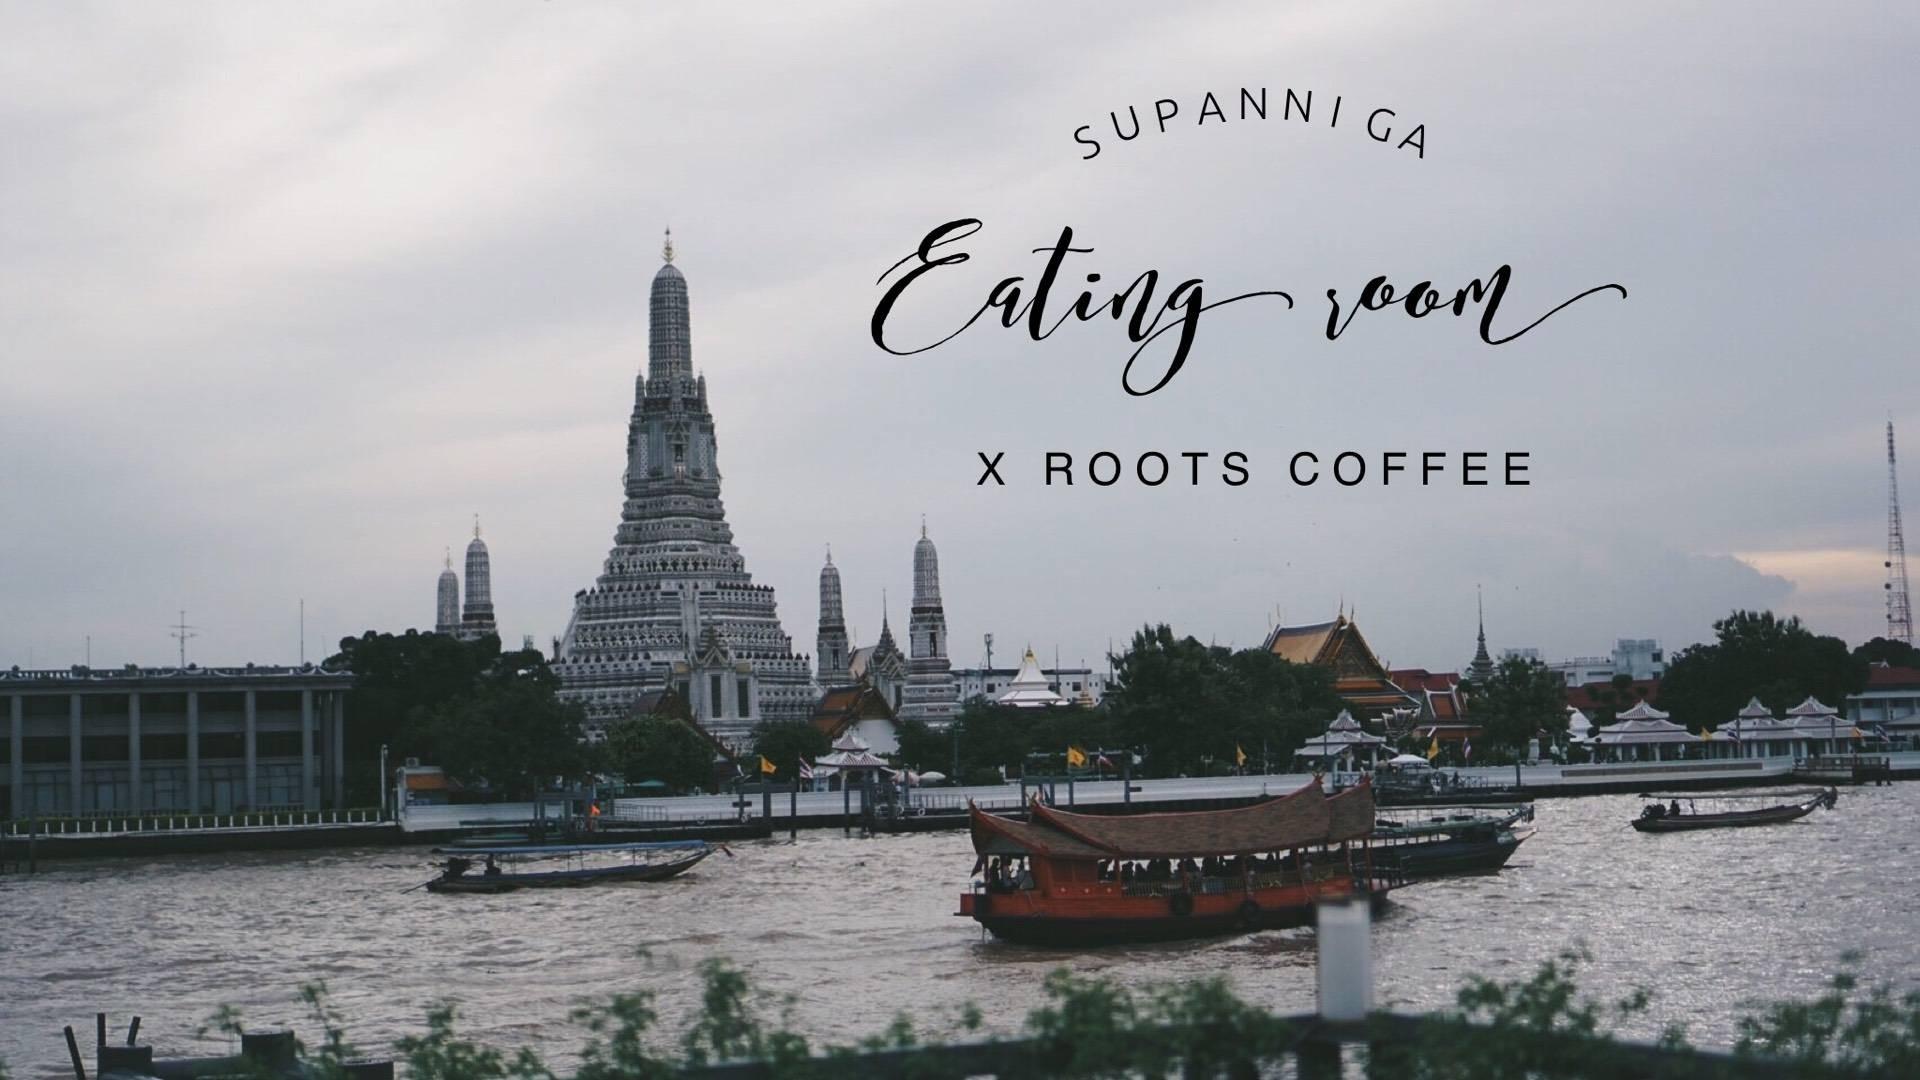 Supanniga Eating Room X Roots Coffee สุพรรณิการ์